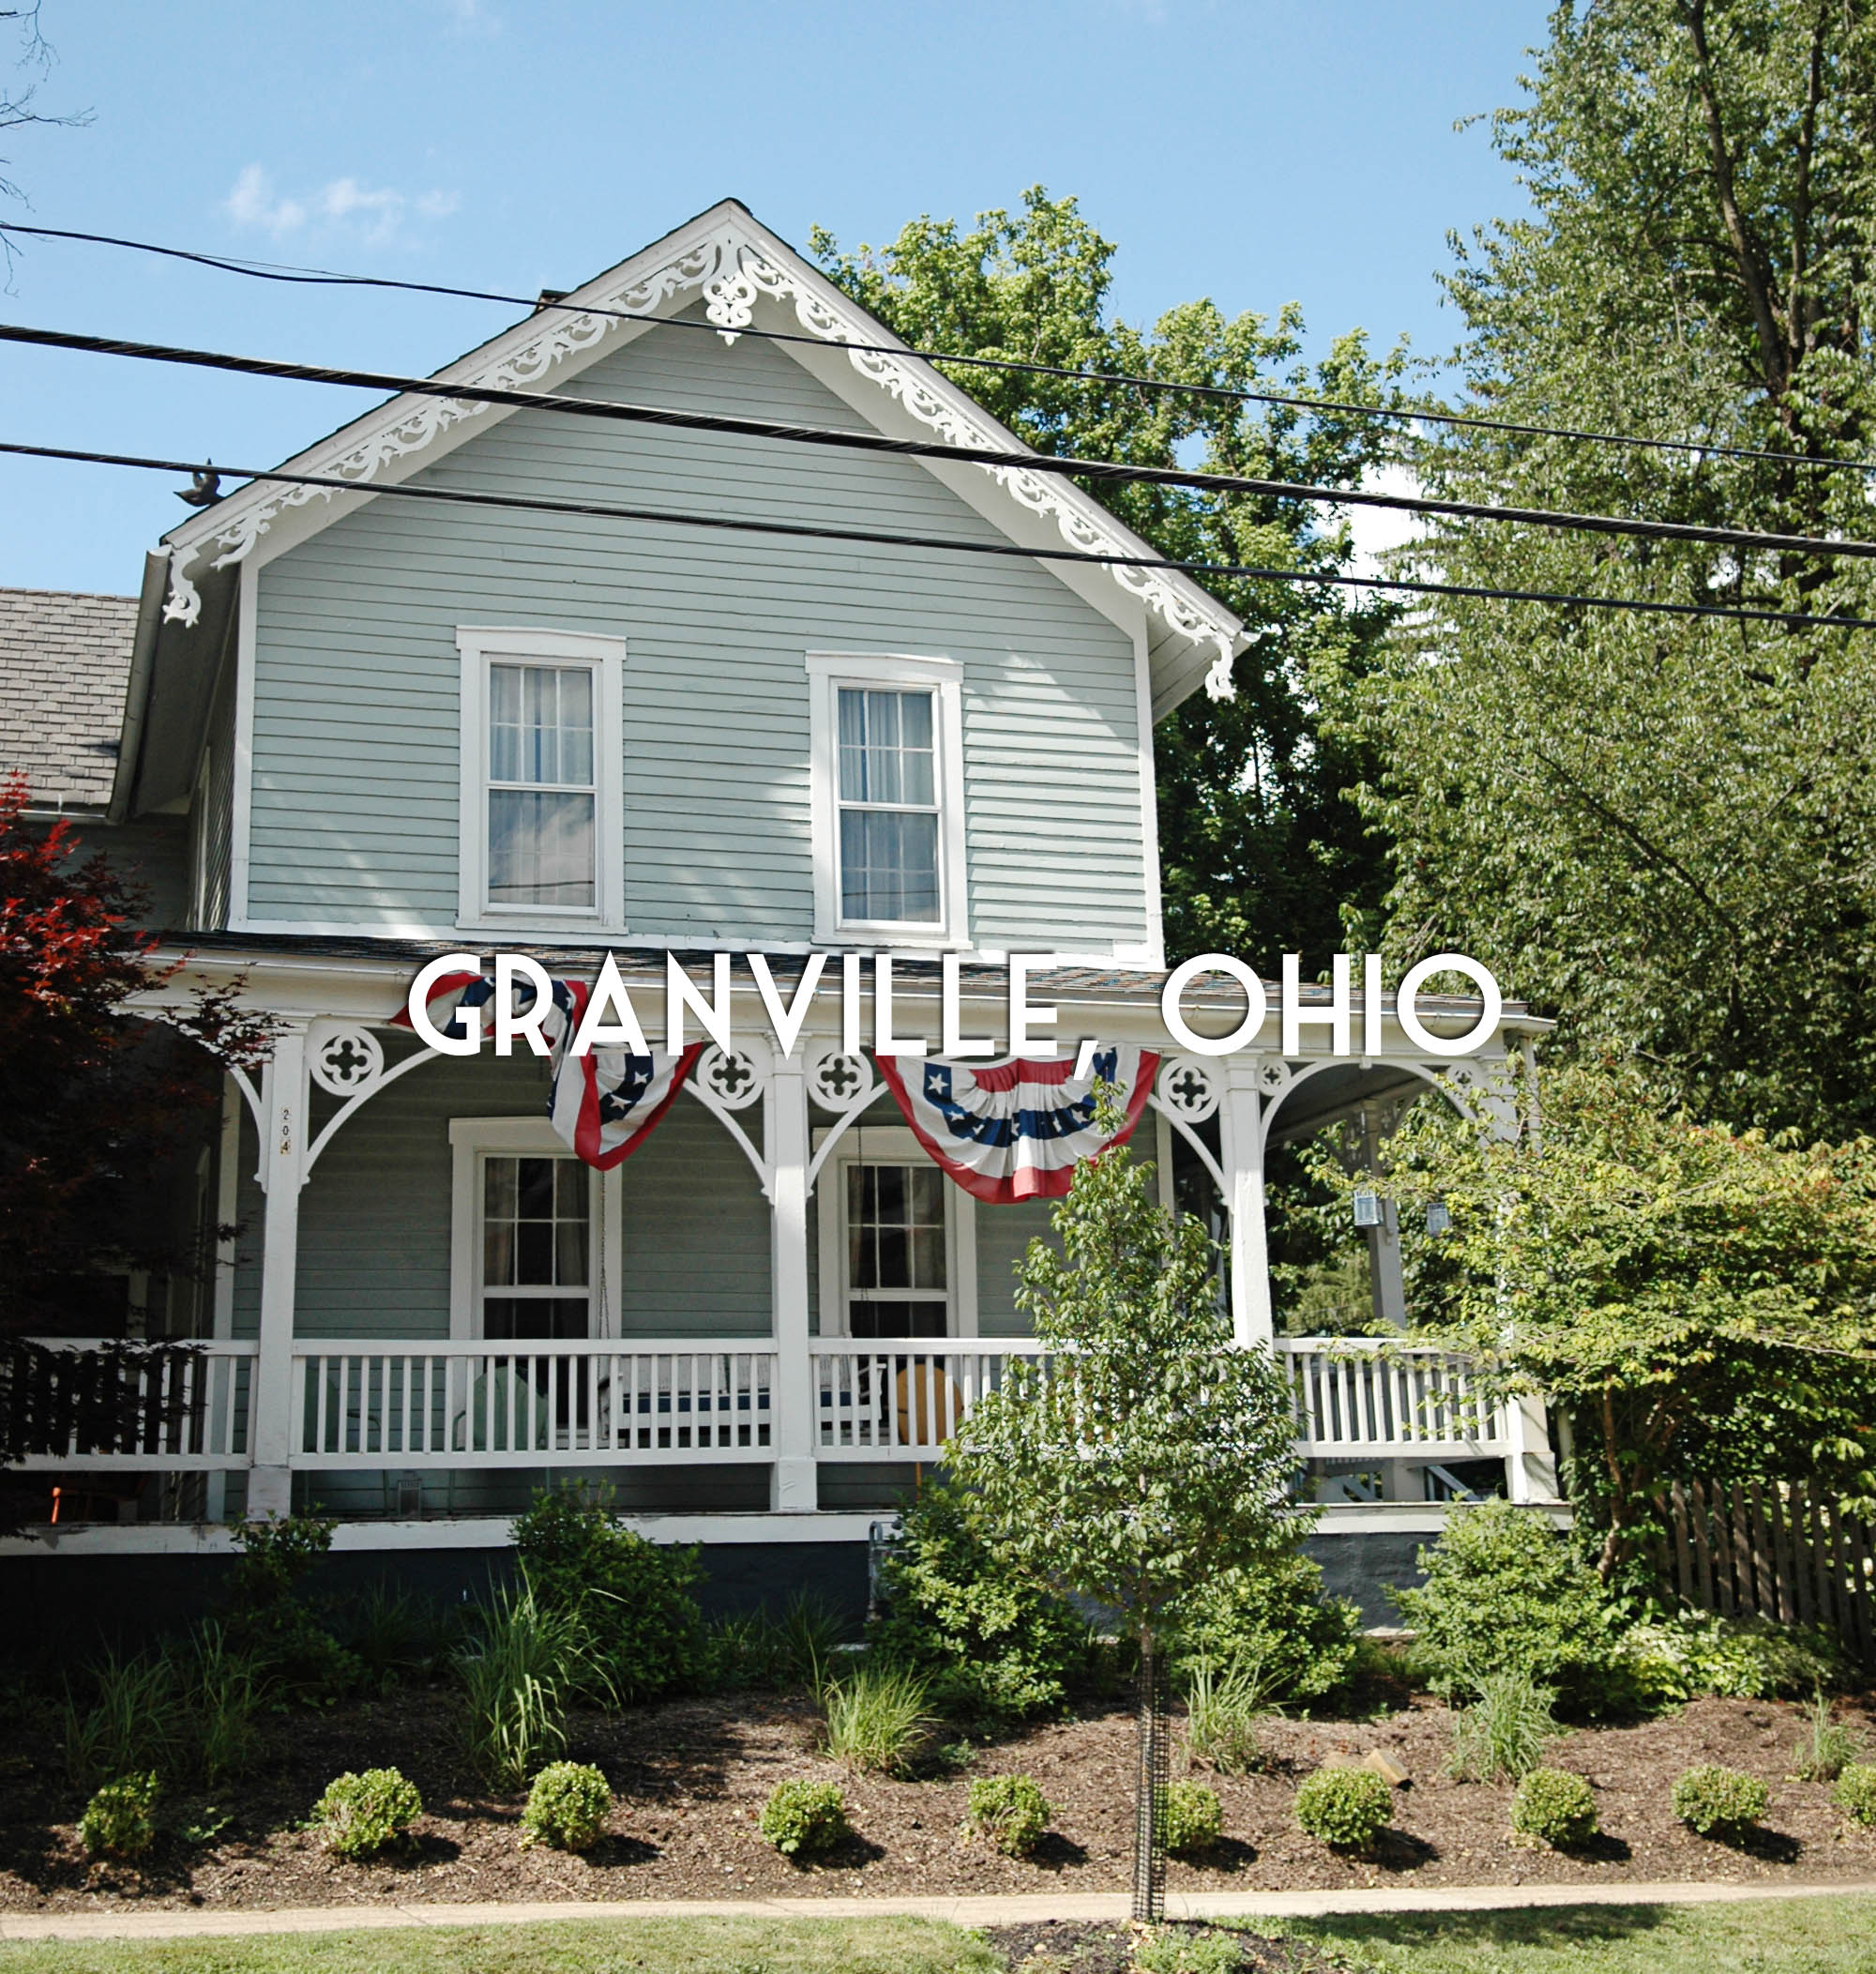 Granville ohio day trip an explorer 39 s heart for Granville home